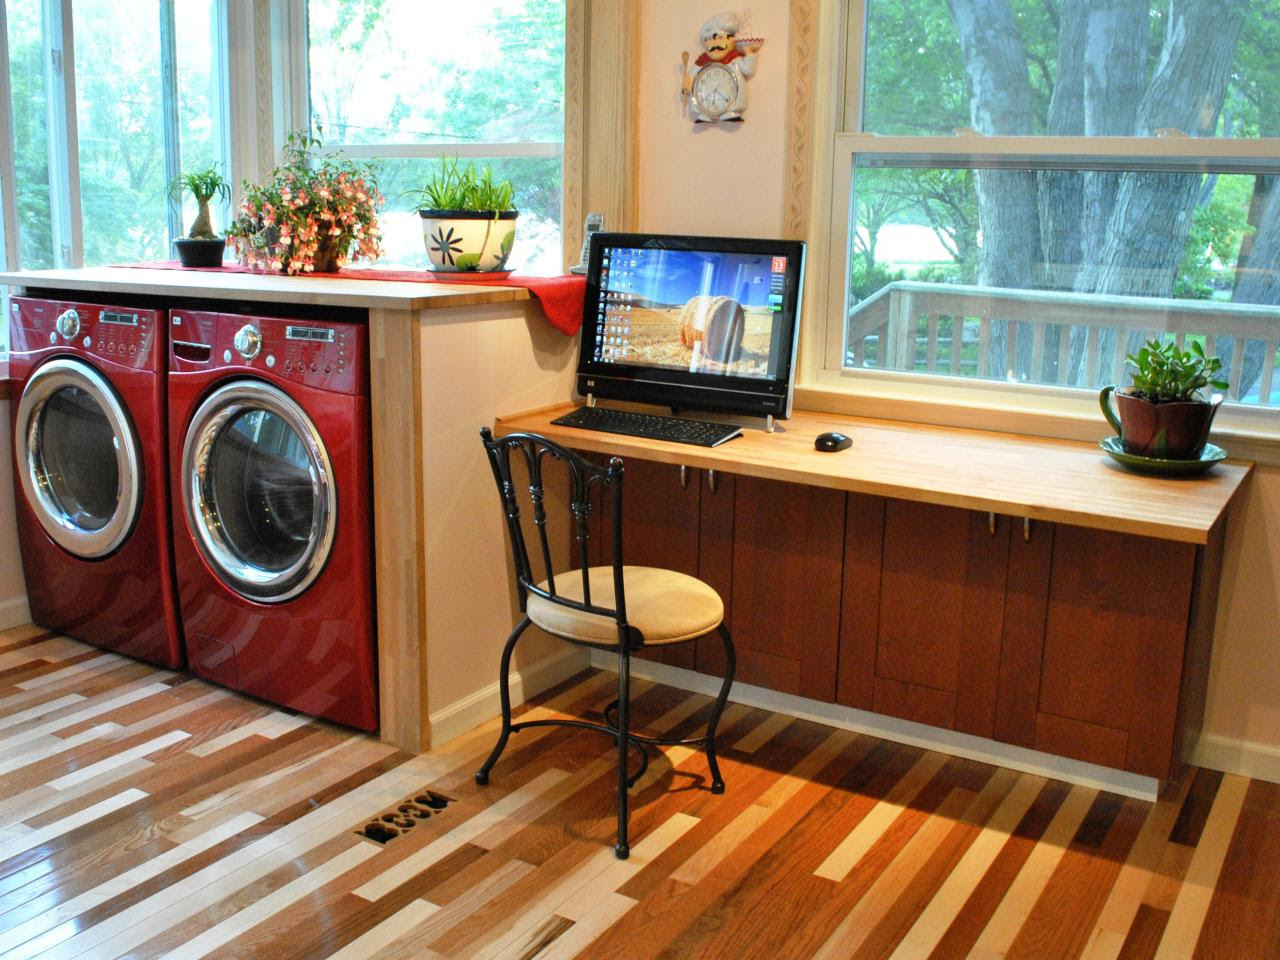 Build a simple kitchen desk with HGTV | HGTV